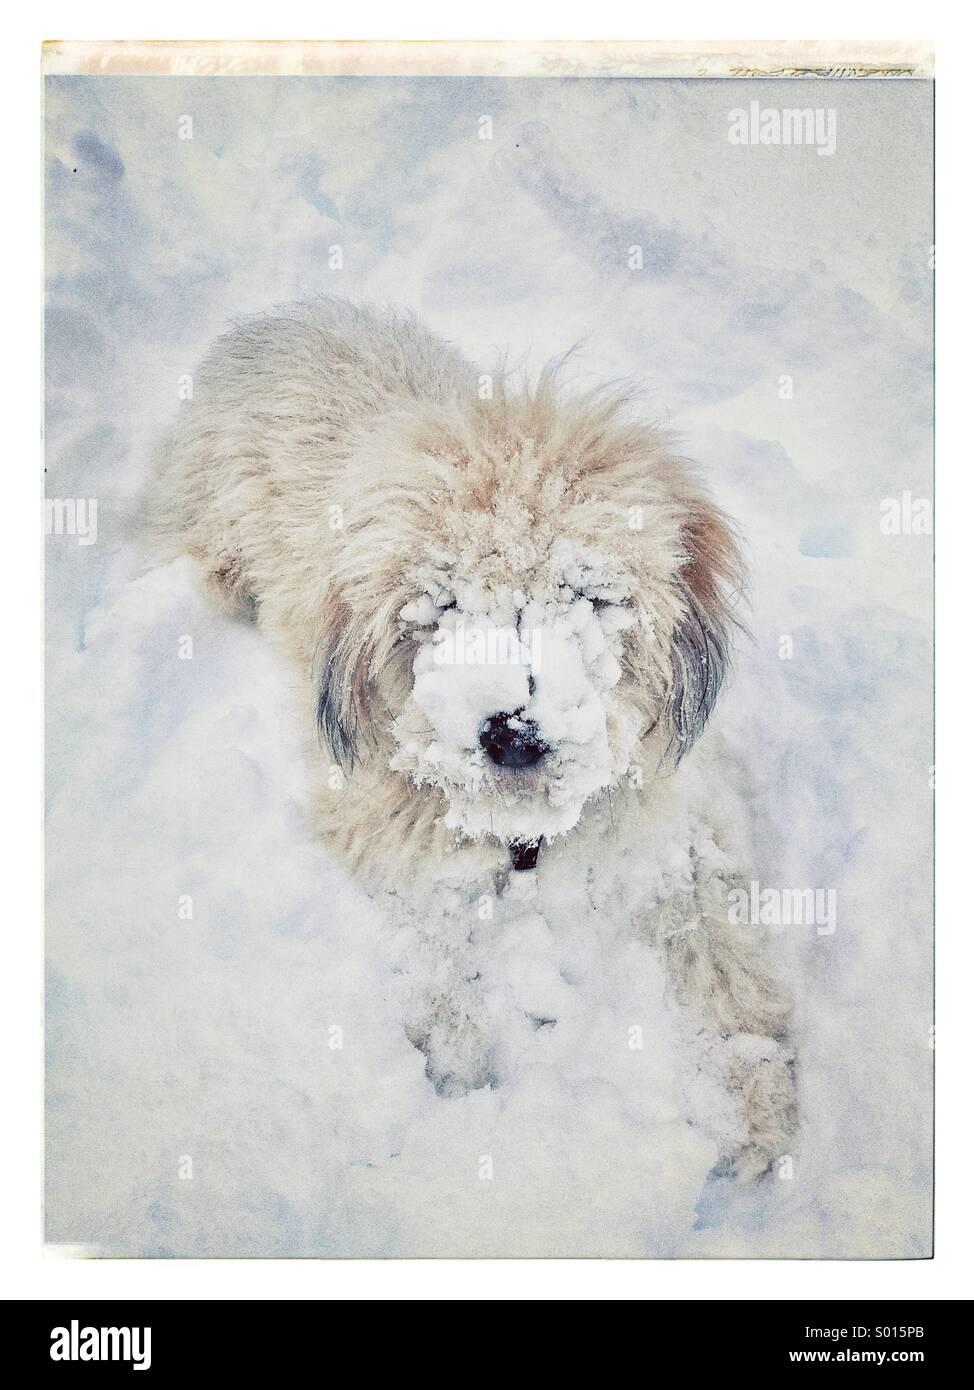 Addominale cane da neve Immagini Stock